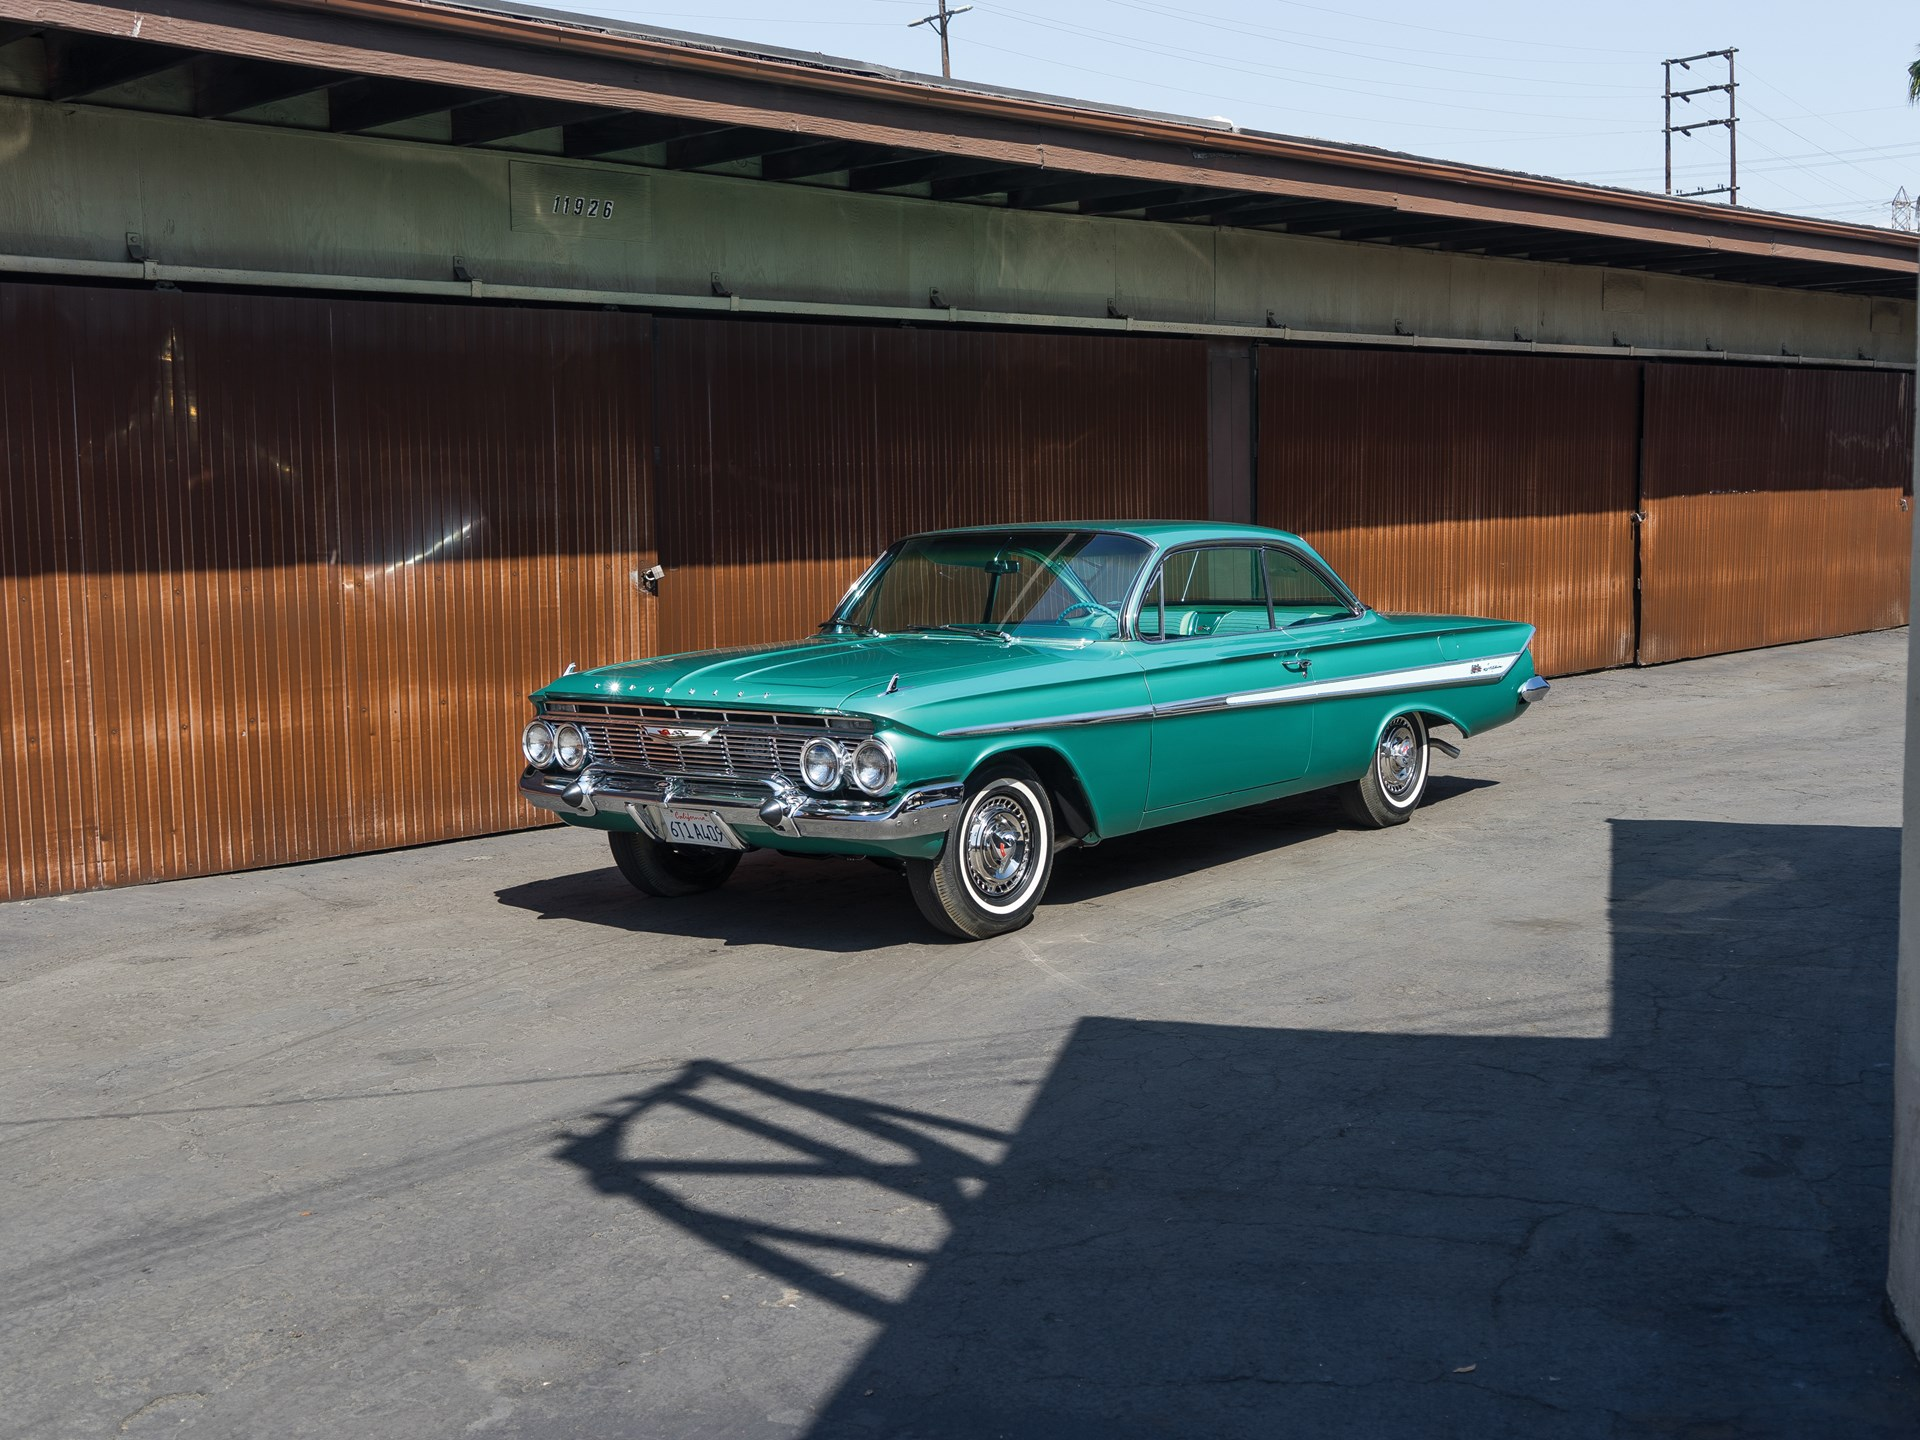 1961 Chevrolet Impala Ss 409 Sport Coupe